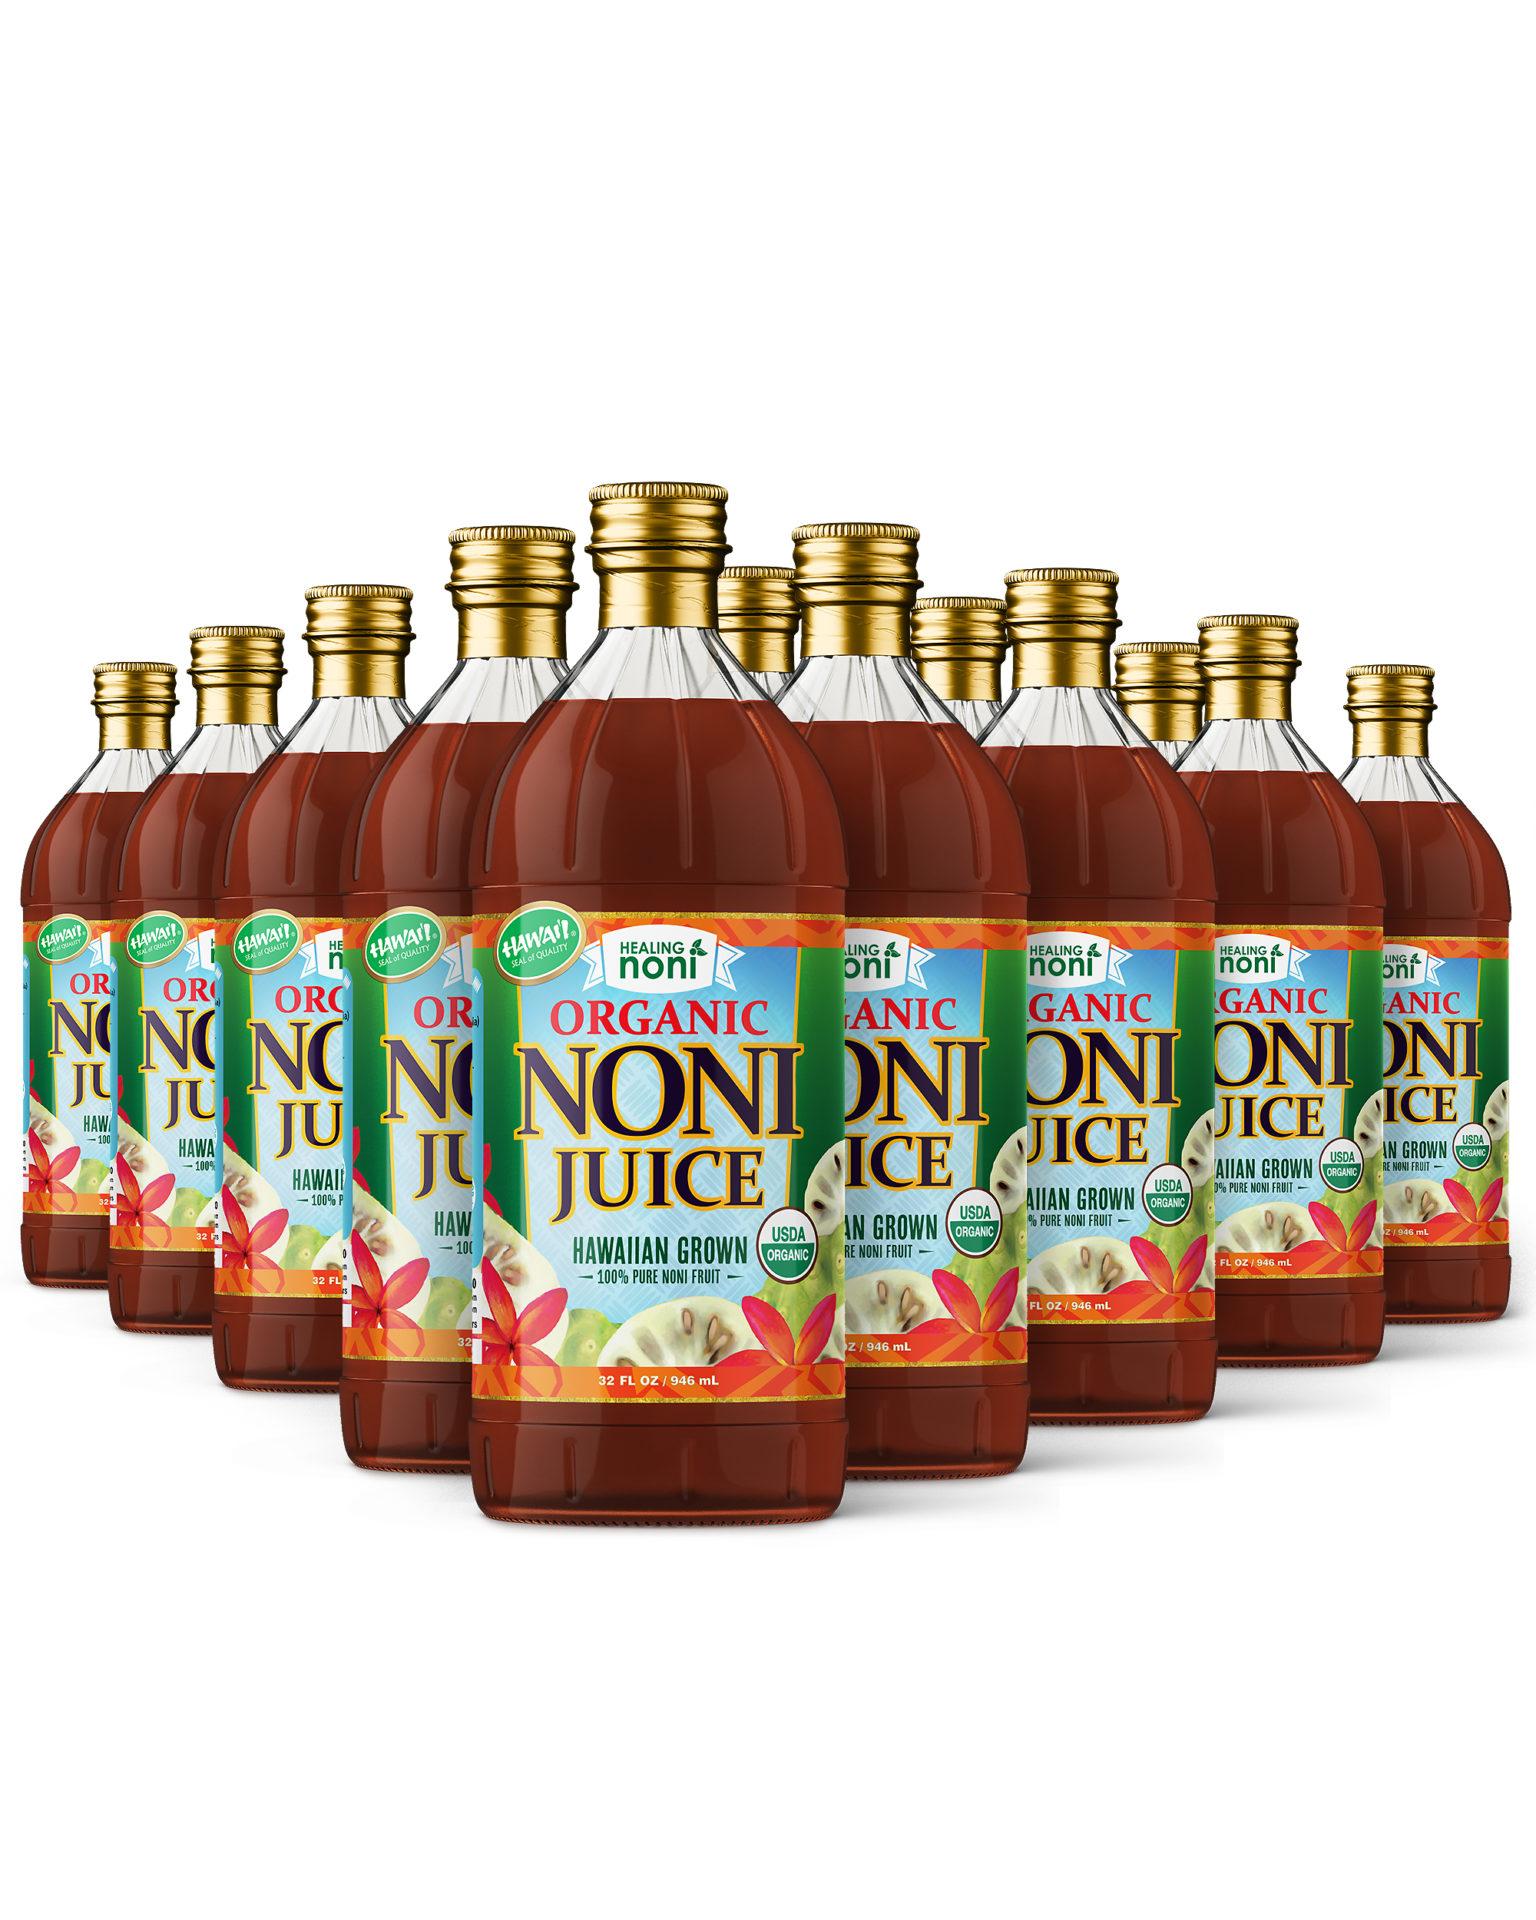 healing noni - USDA approved organic noni juice